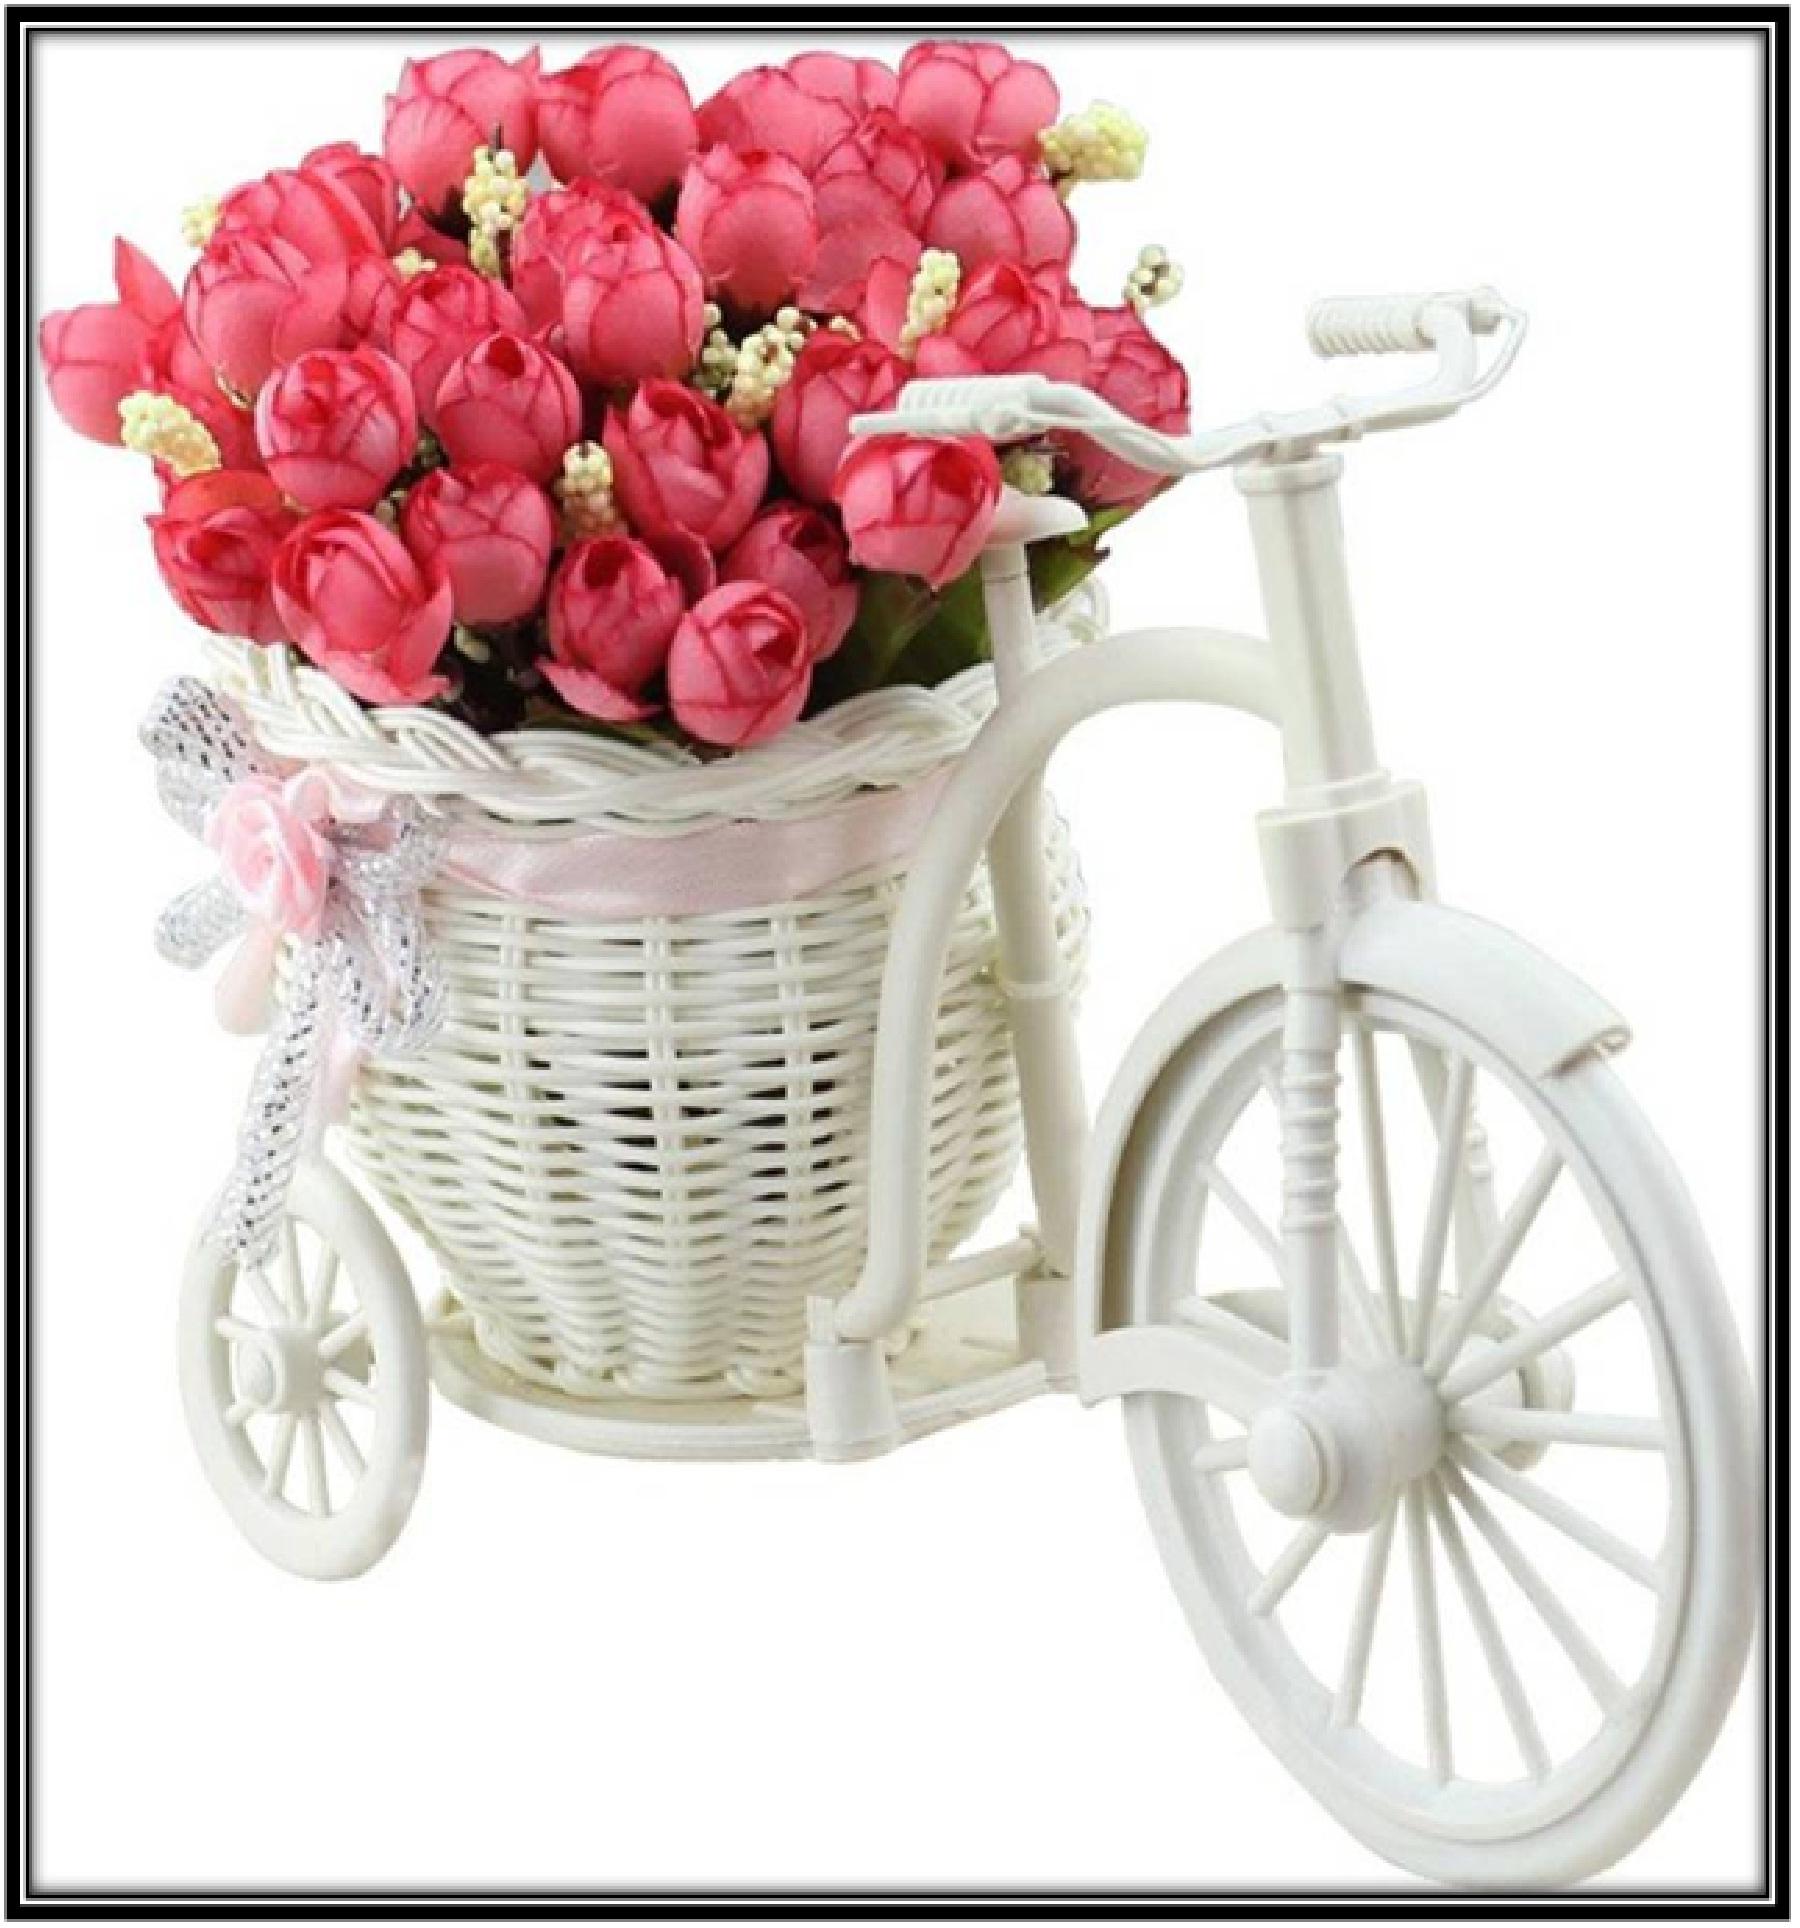 A flower basket prop - home decor ideas